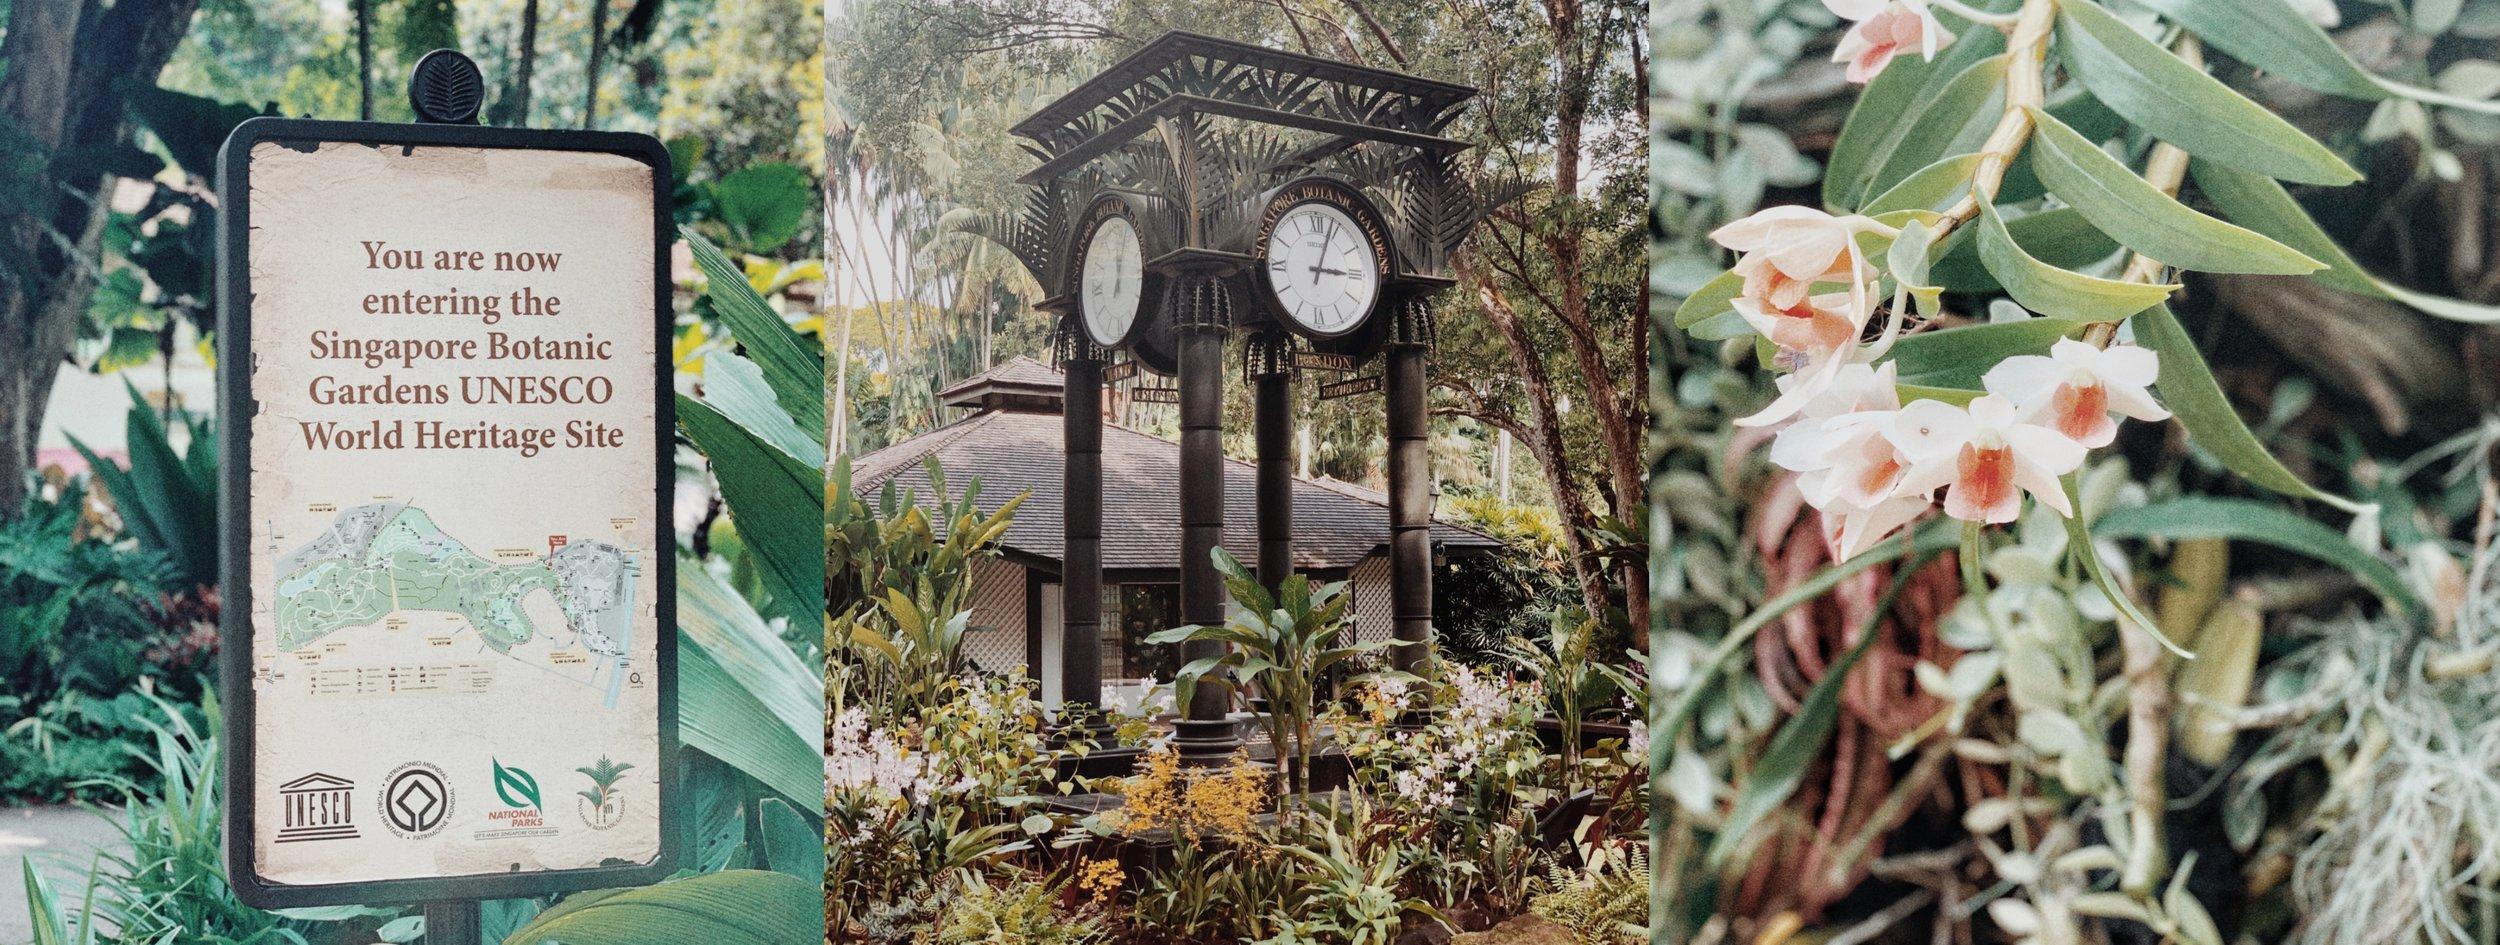 Botanic Gardins, World Heritage Site